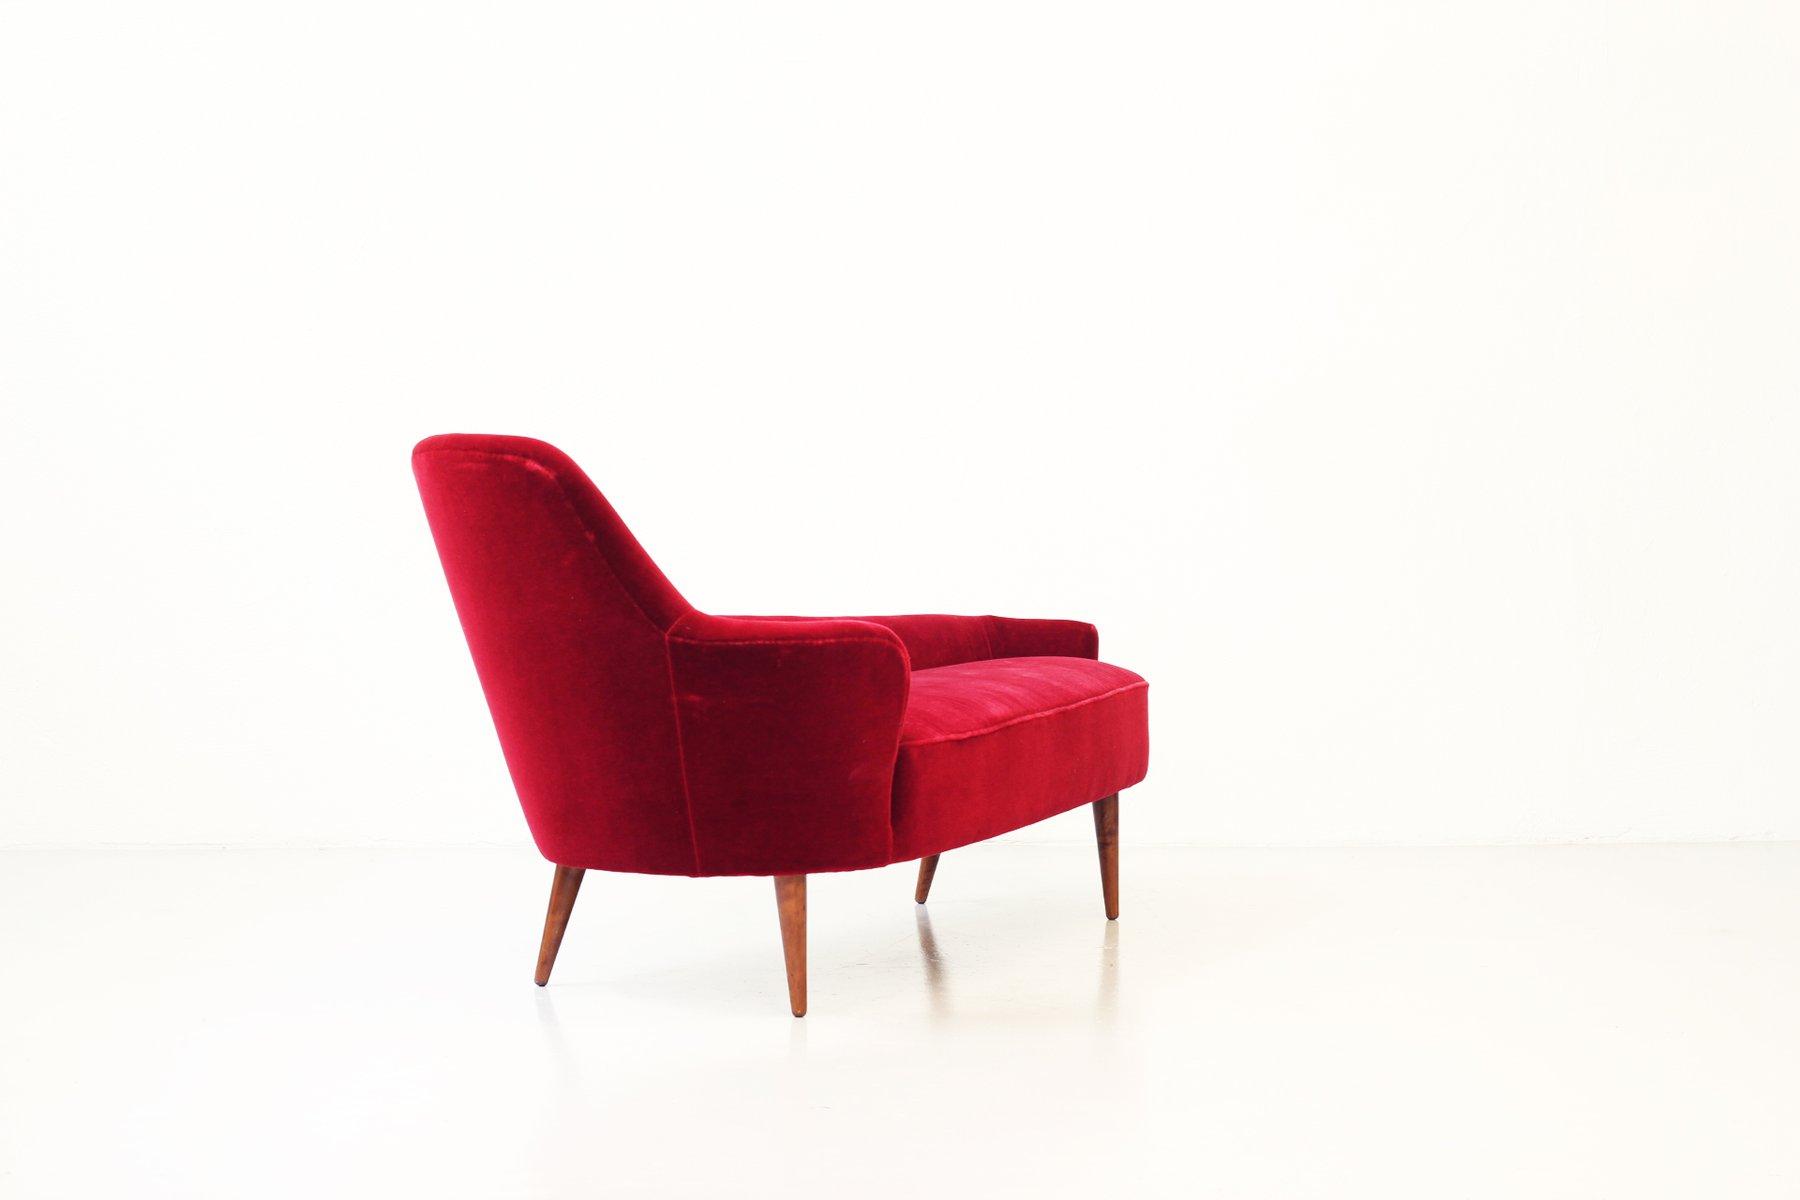 Singoalla chaise lounge by gillis lundgren for ikea 1961 for Chaise design ikea